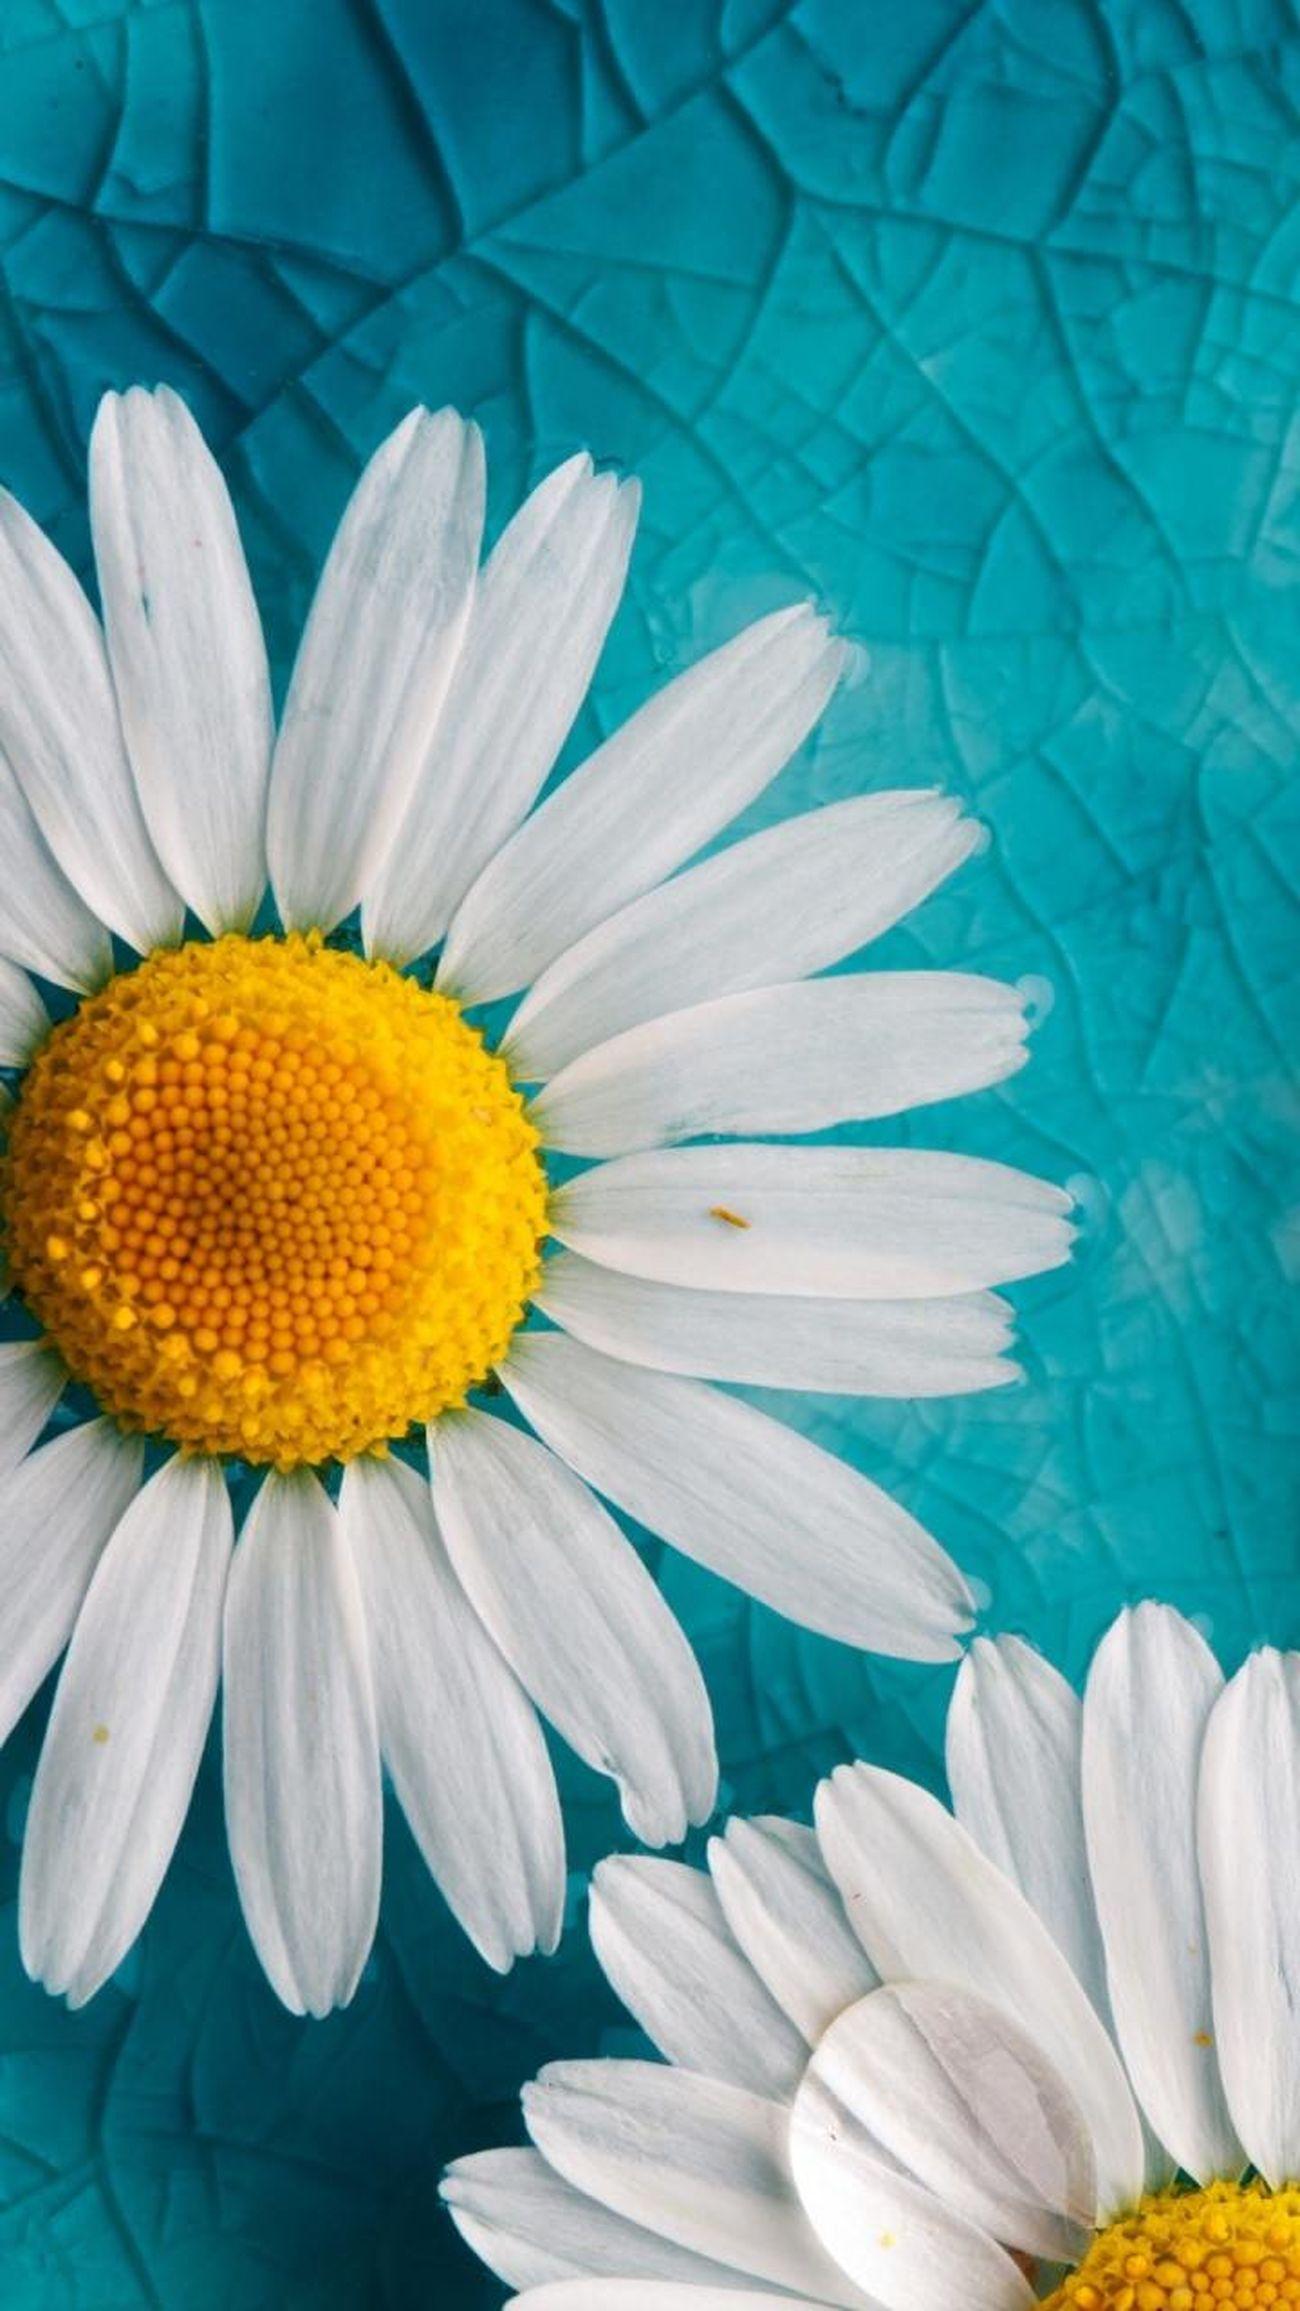 Relaxing Izmir/ Bornova EyeEm Nature Lover EyeEm Best Shots EyeEmBestPics EyeEm Flower Flower Collection